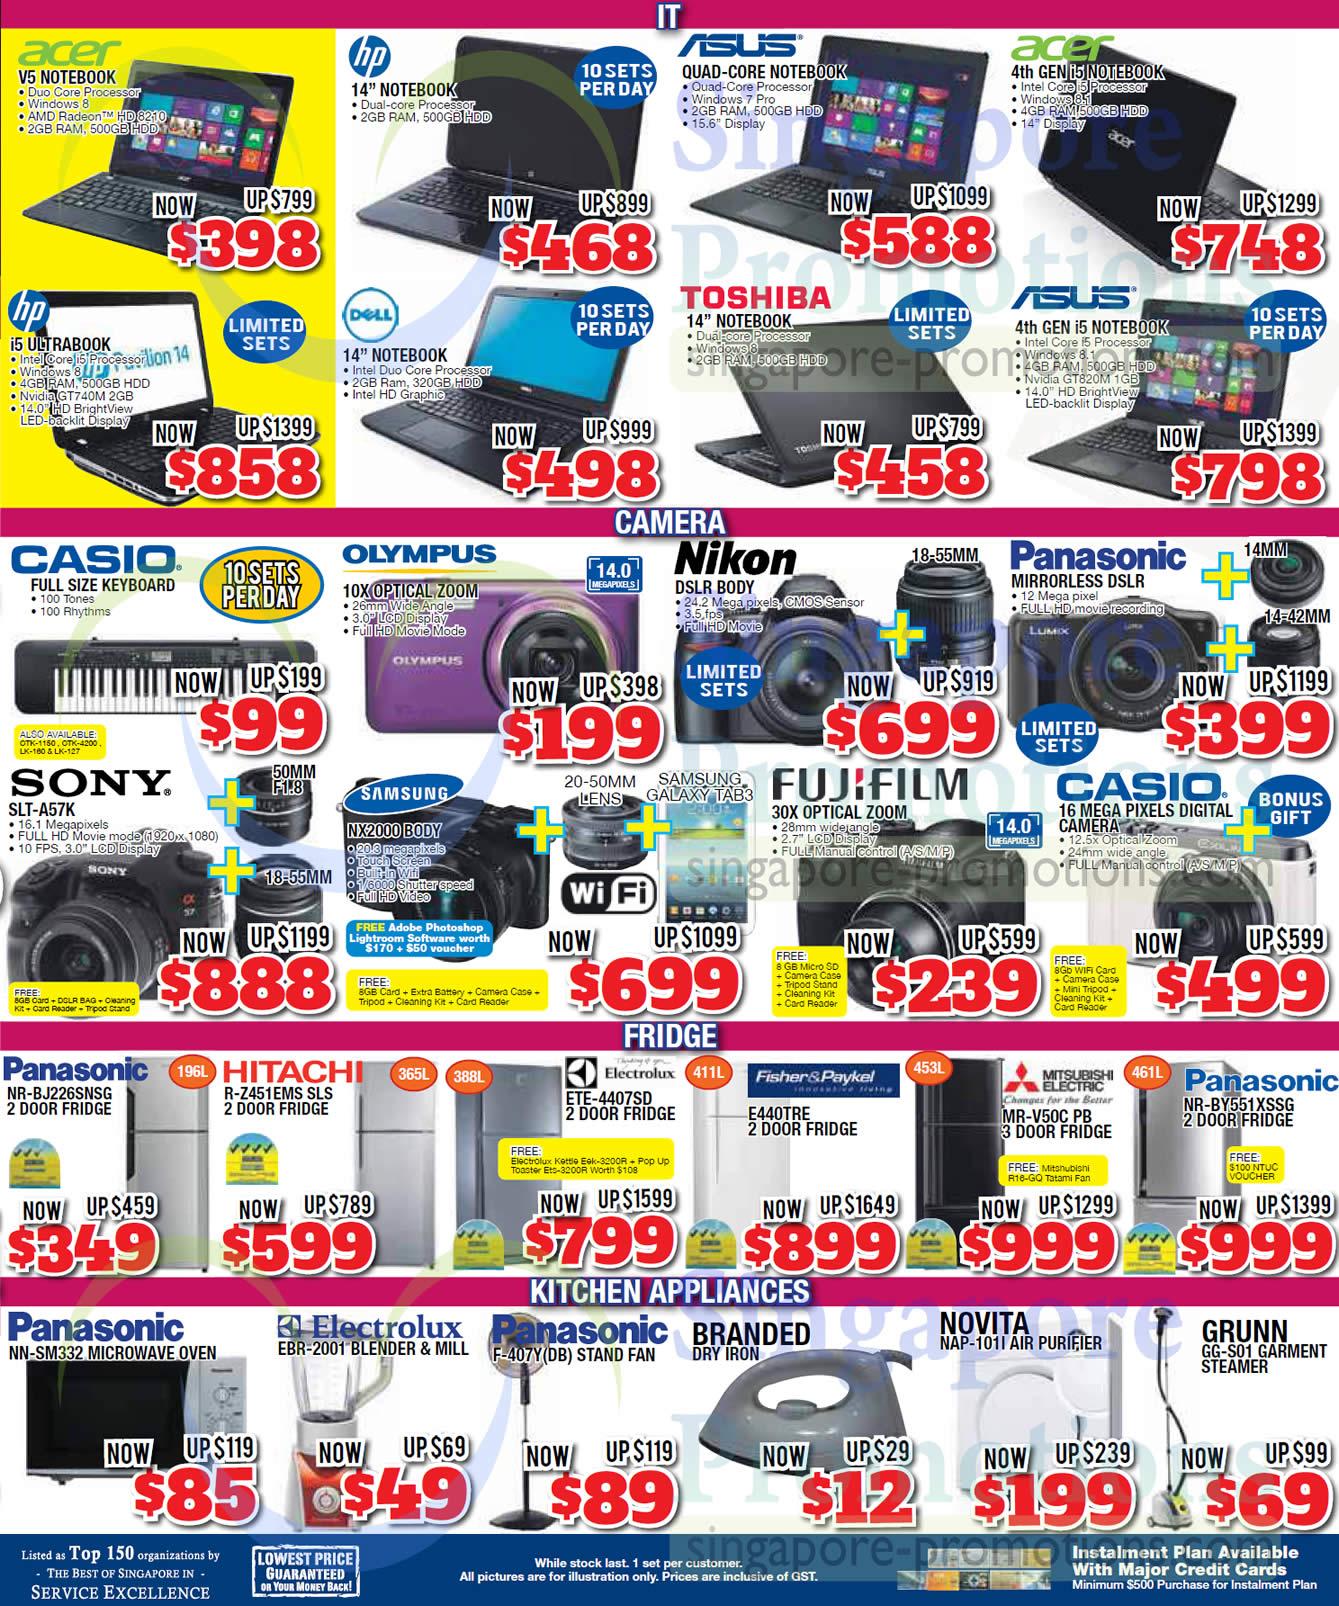 Sony SLT-A57K DSLR Digital Camera, Samsung NX2000 Digital Camera, Panasonic NR-BJ226SNSG Fridge, Hitachi R-Z451EMS Fridge, Electrolux ETE-4407SD Fridge, Fisher & Paykel E440TRE Fridge, Mitsubishi Electric MR-V50C Fridge, Panasonic NR-BY551XSSG Fridge, Panasonic NN-SM332 Oven, Panasonic F-407Y Fan, Novita NAP-101I Air Purifier and Grunn GG-S01 Garment Steamer